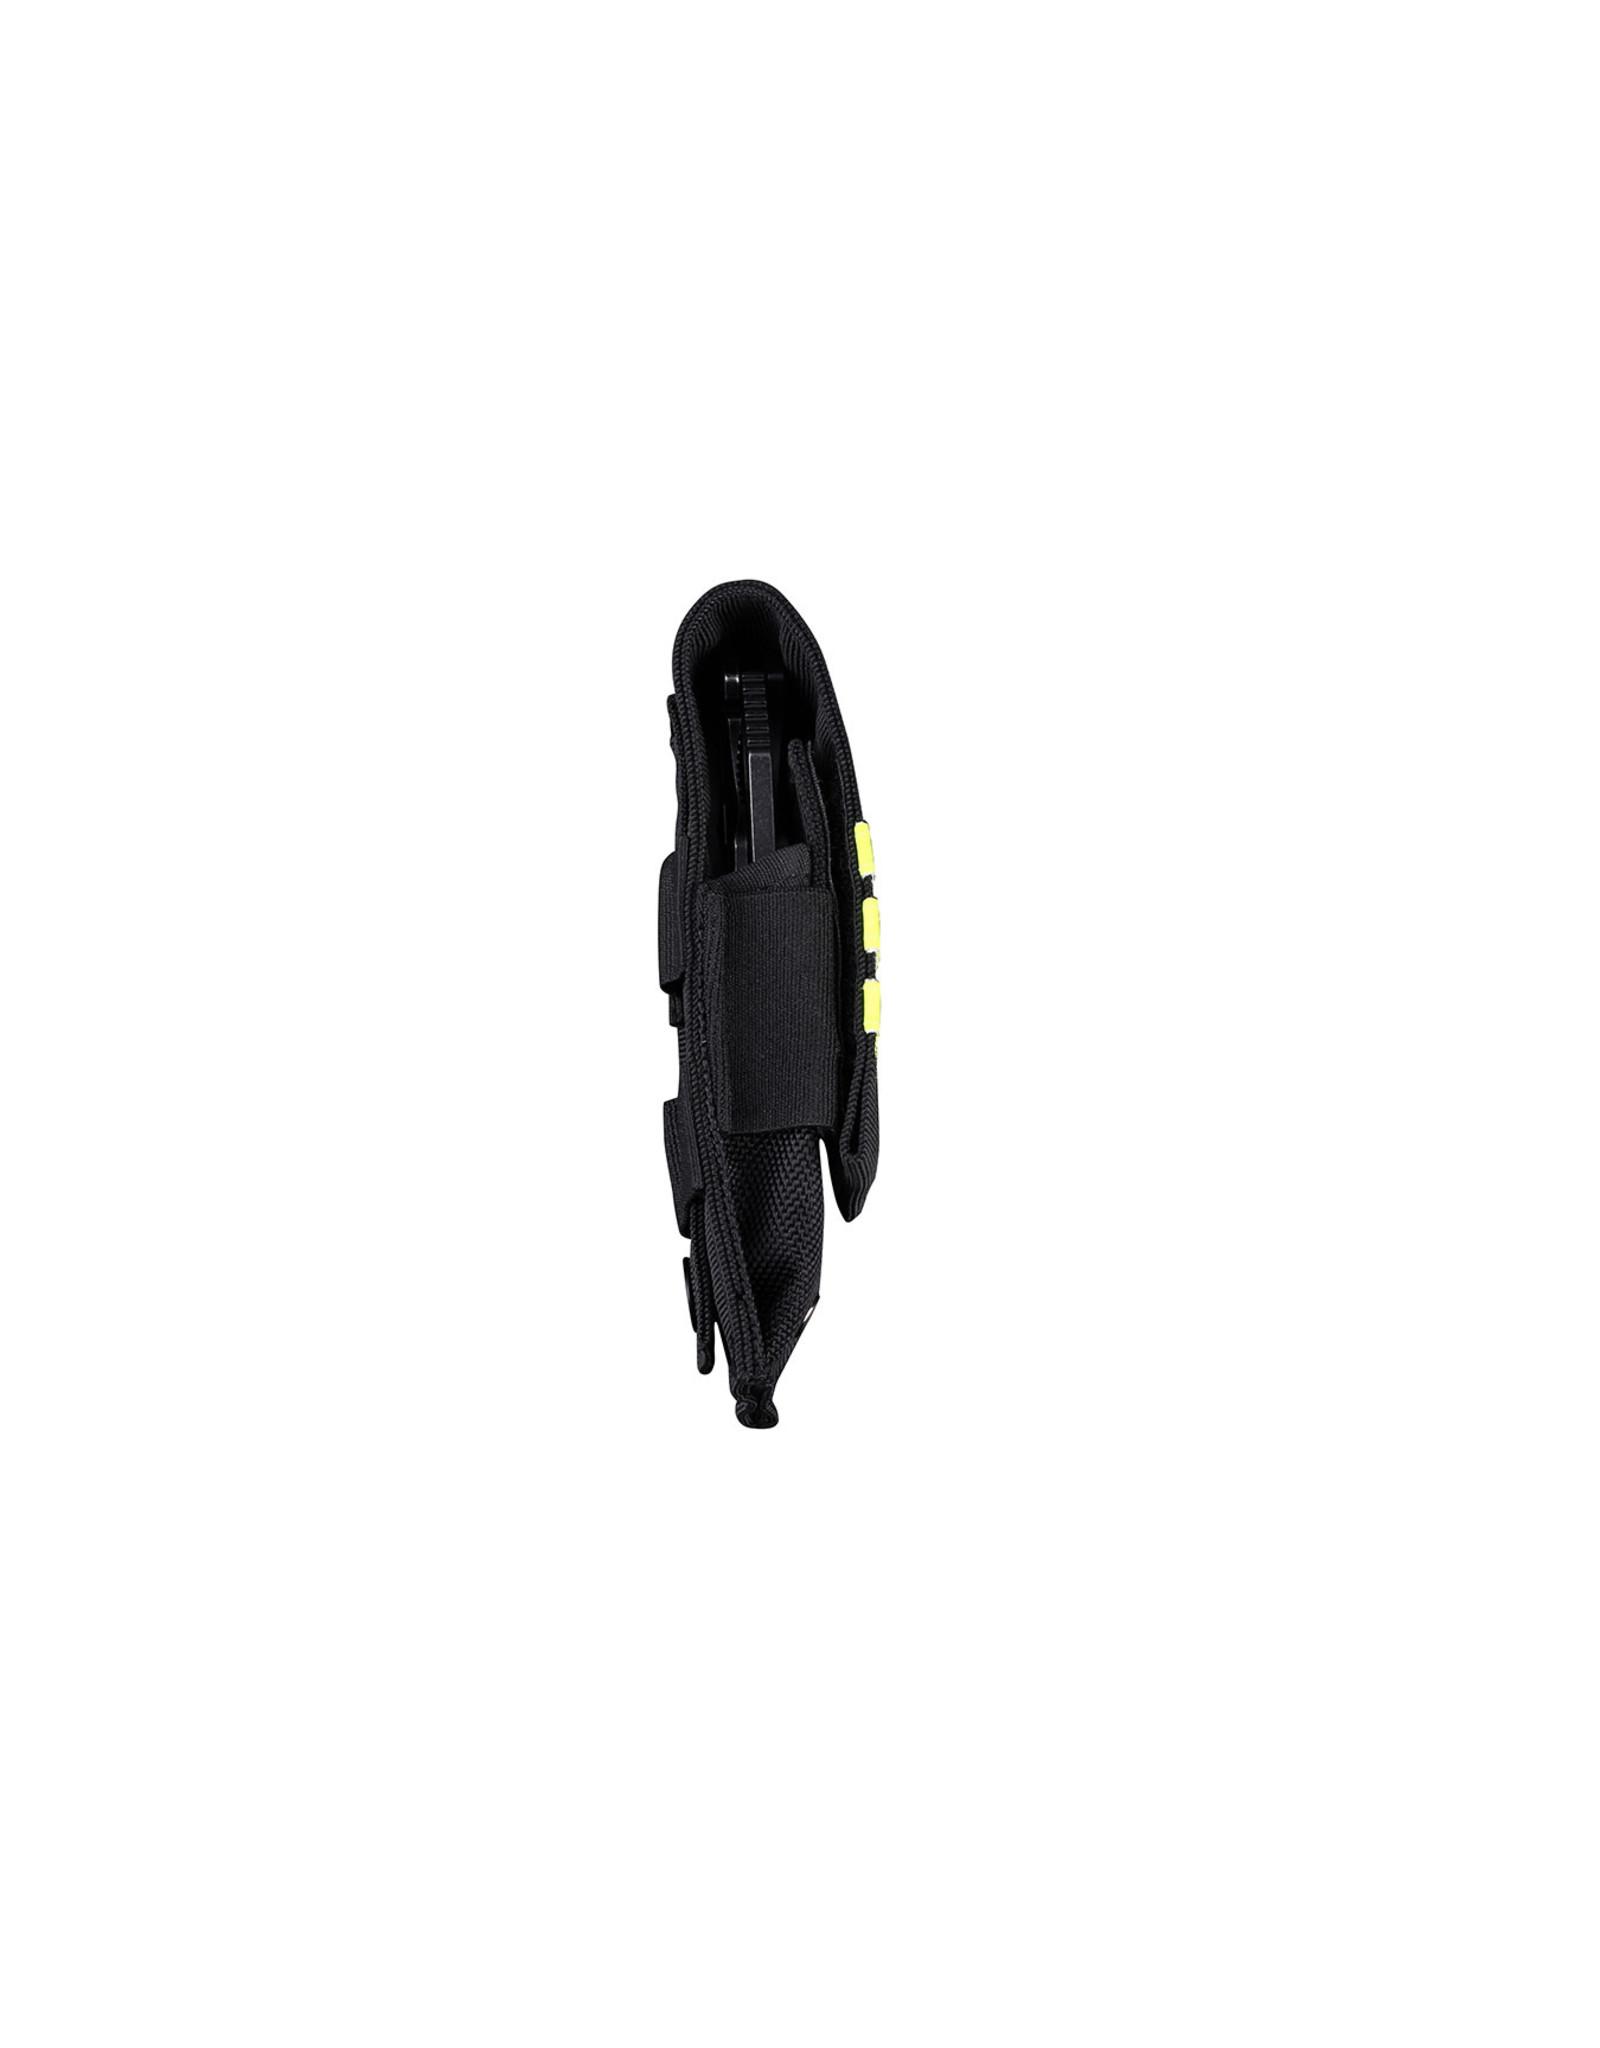 RUIKE KNIVES M195-B FOLDING SAFETY KNIFE